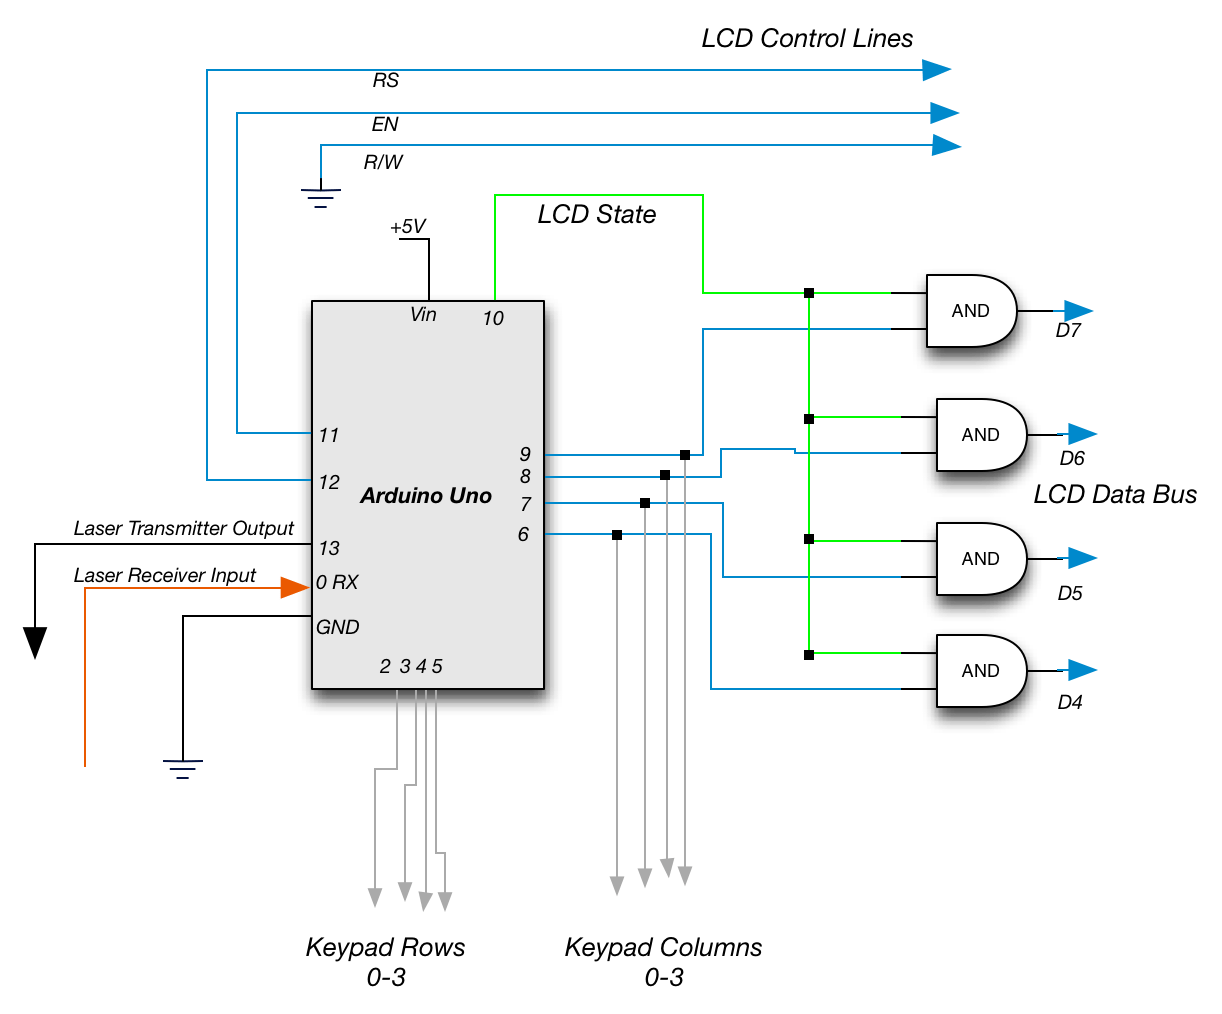 electronic number lock circuit diagram minn kota riptide 55 wiring keypad schematic get free image about